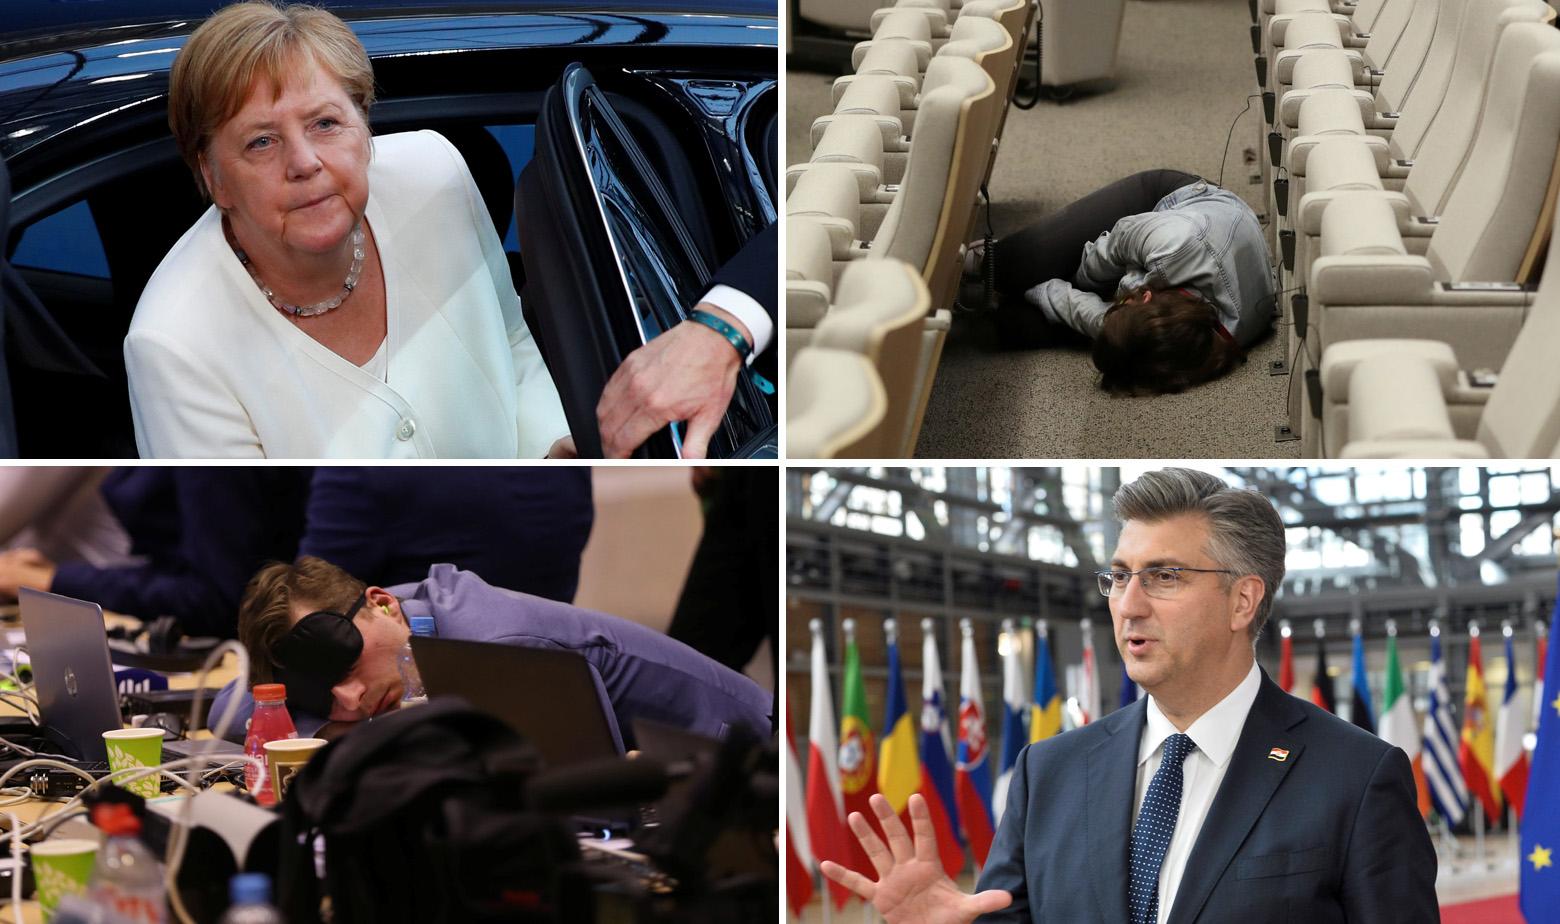 Angela Merkel, Andrej Plenković i prizori iz Bruxellesa tijekom summita